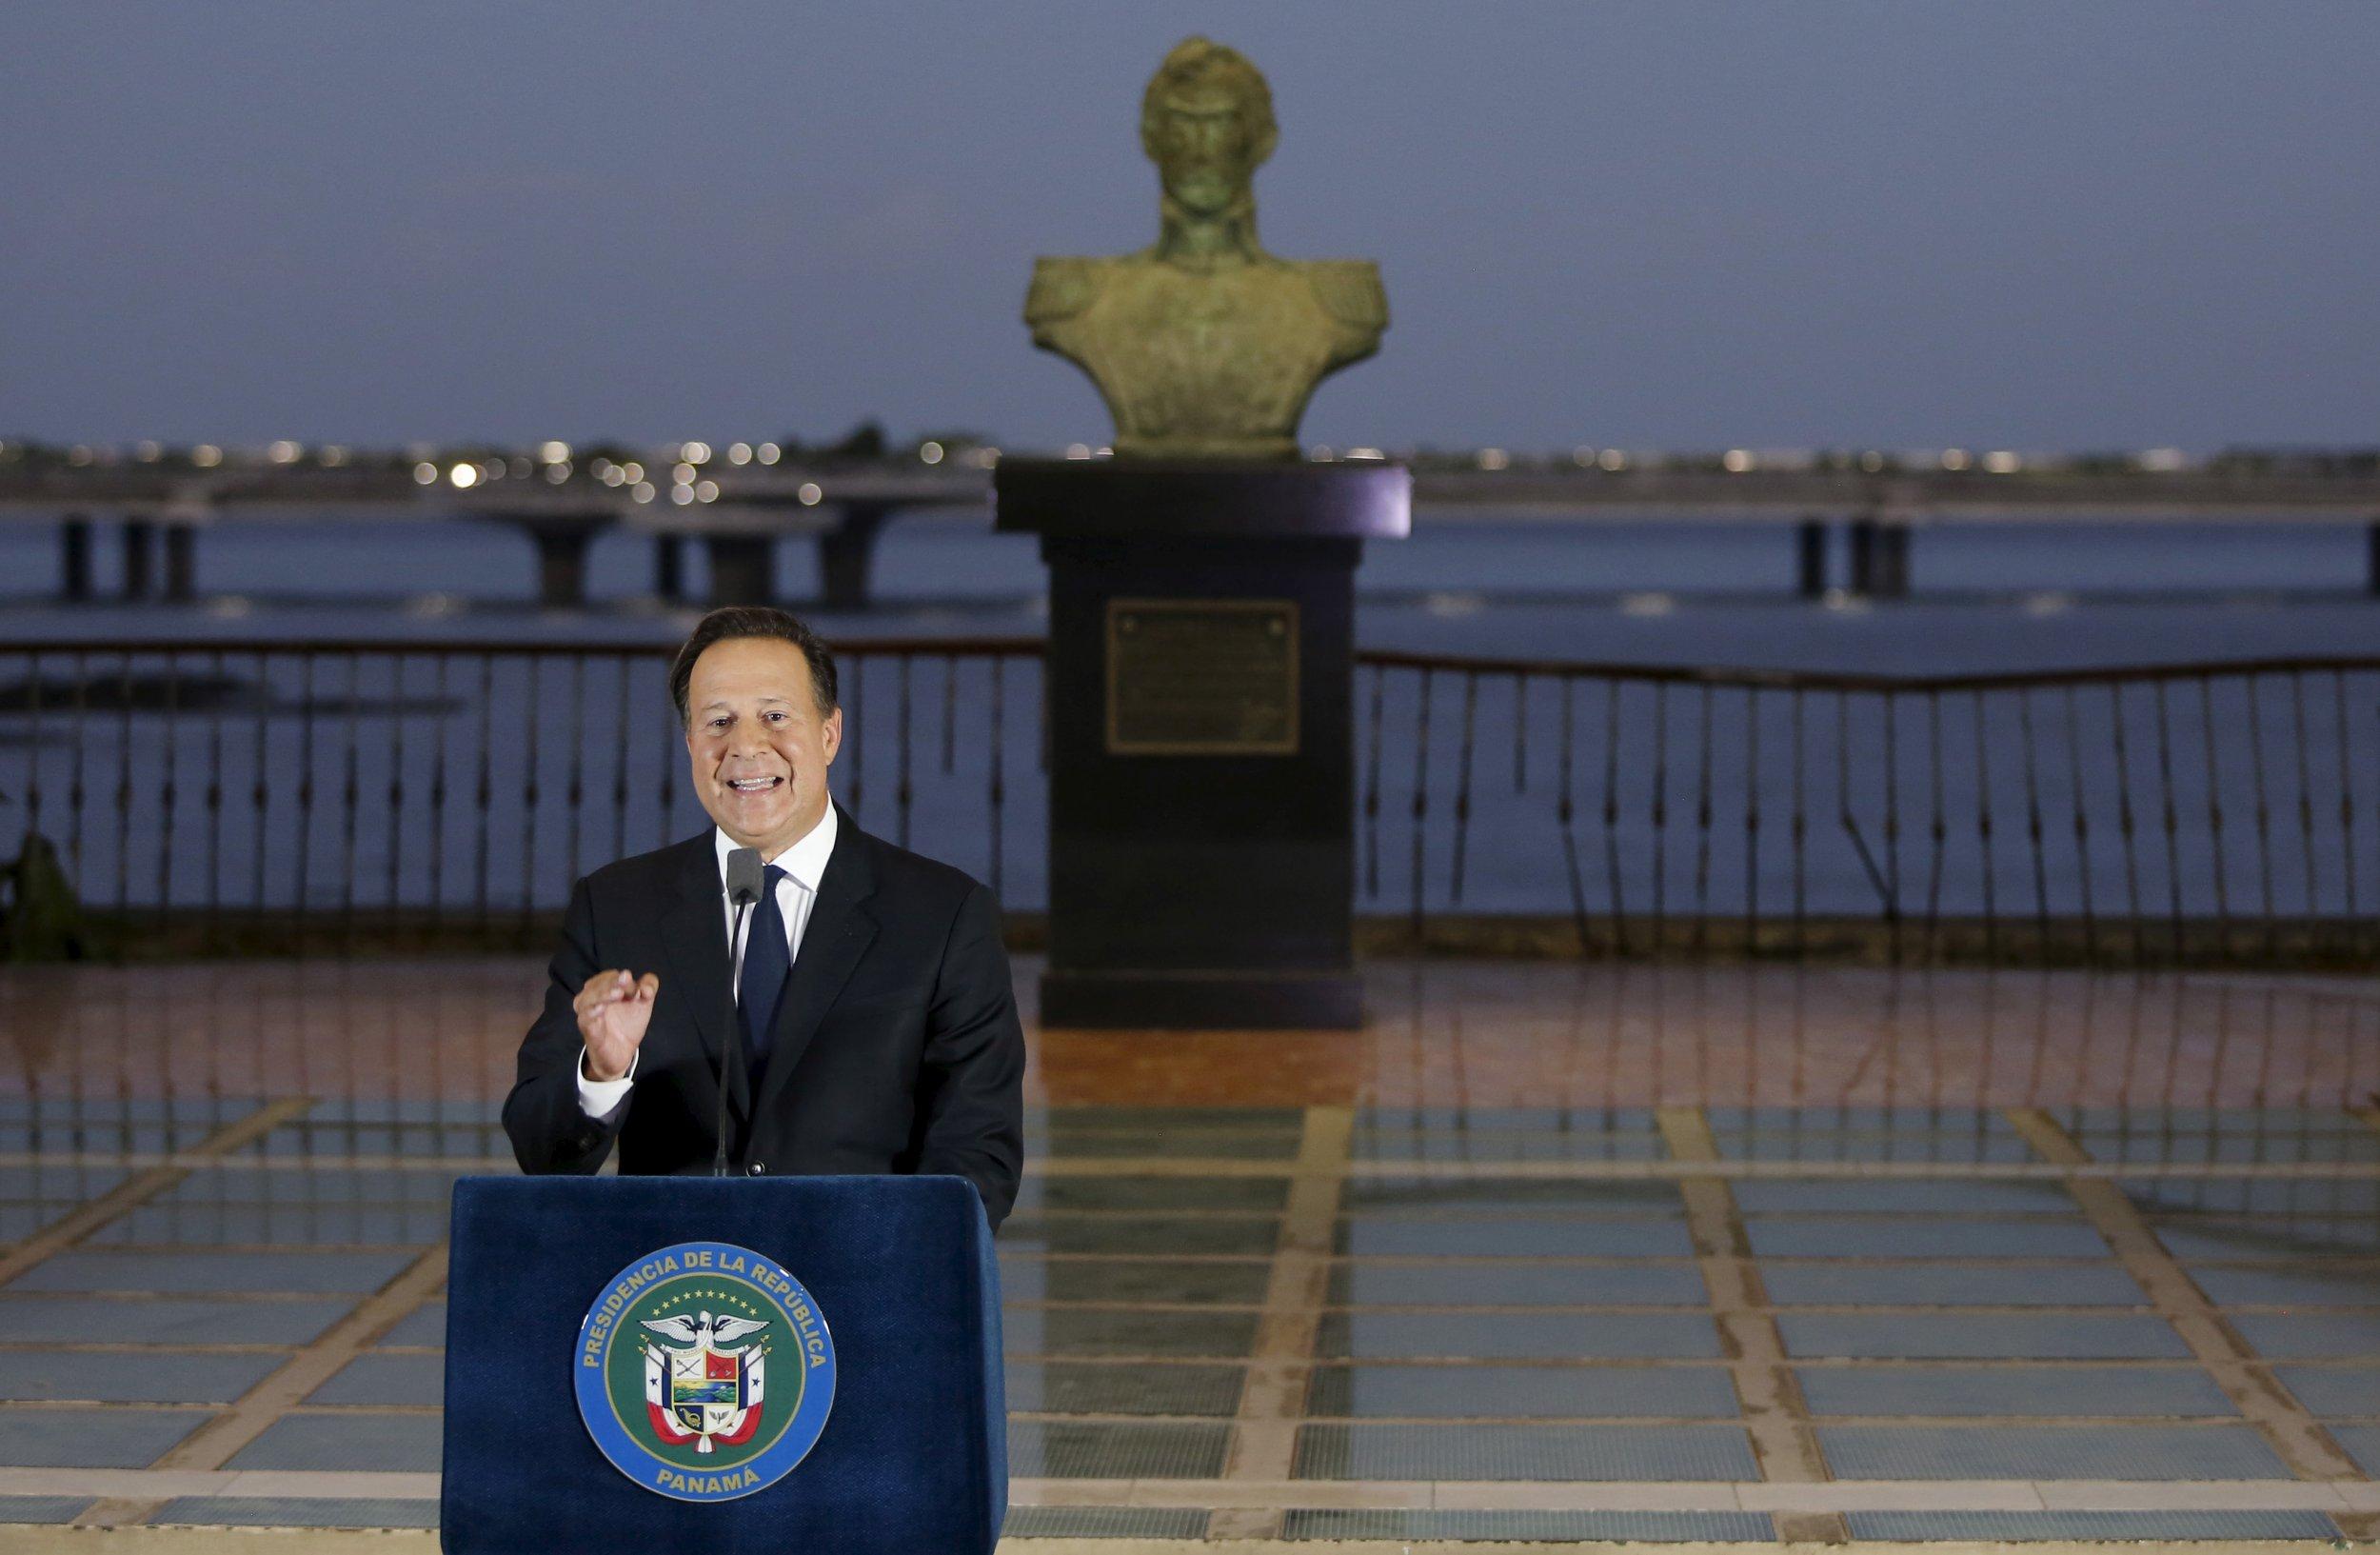 Panama's president